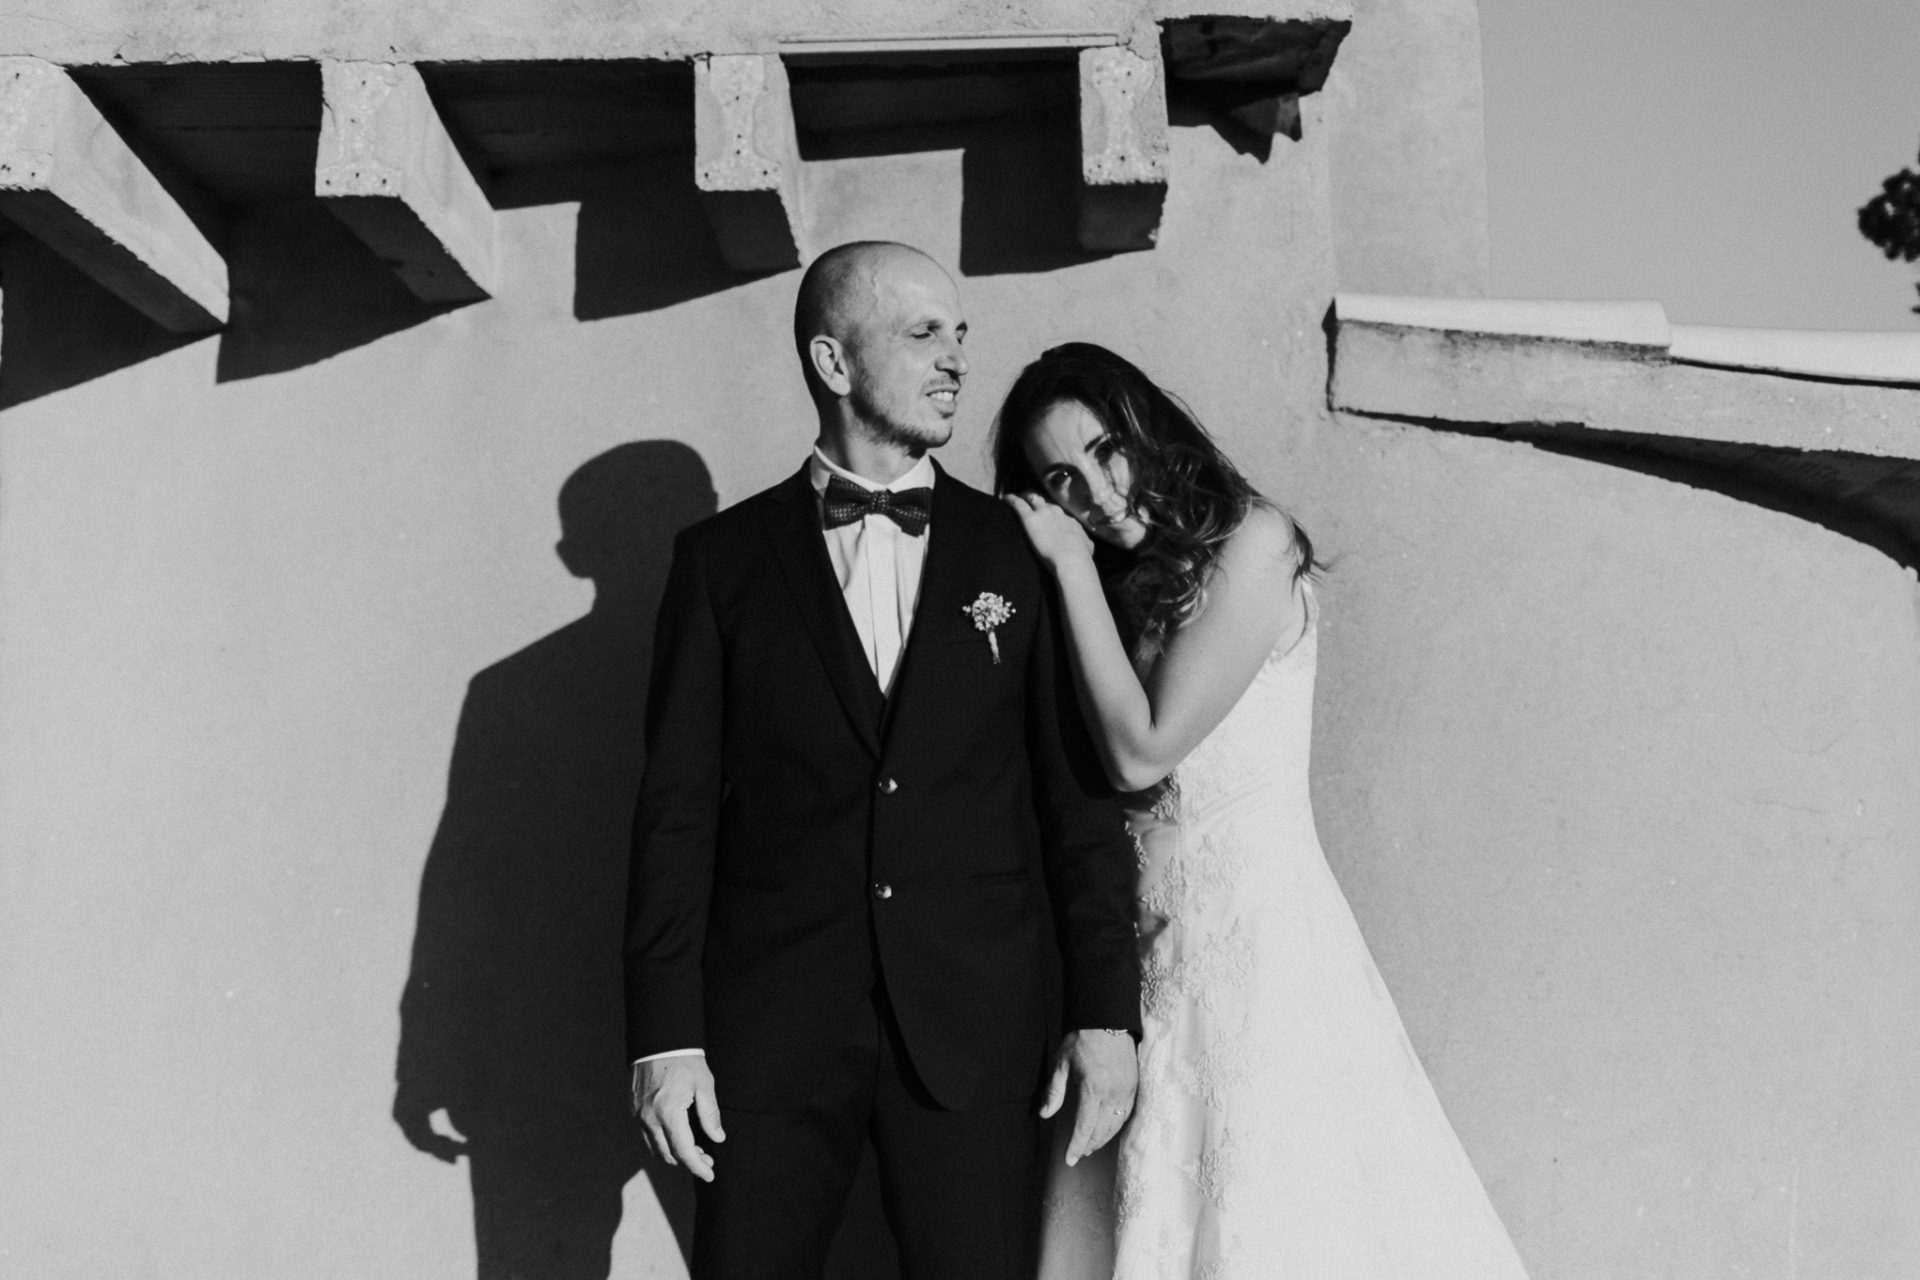 Beto Perez es un fotógrafo de bodas en la costa brava, Mathilde & Jhon se casaron en Begur